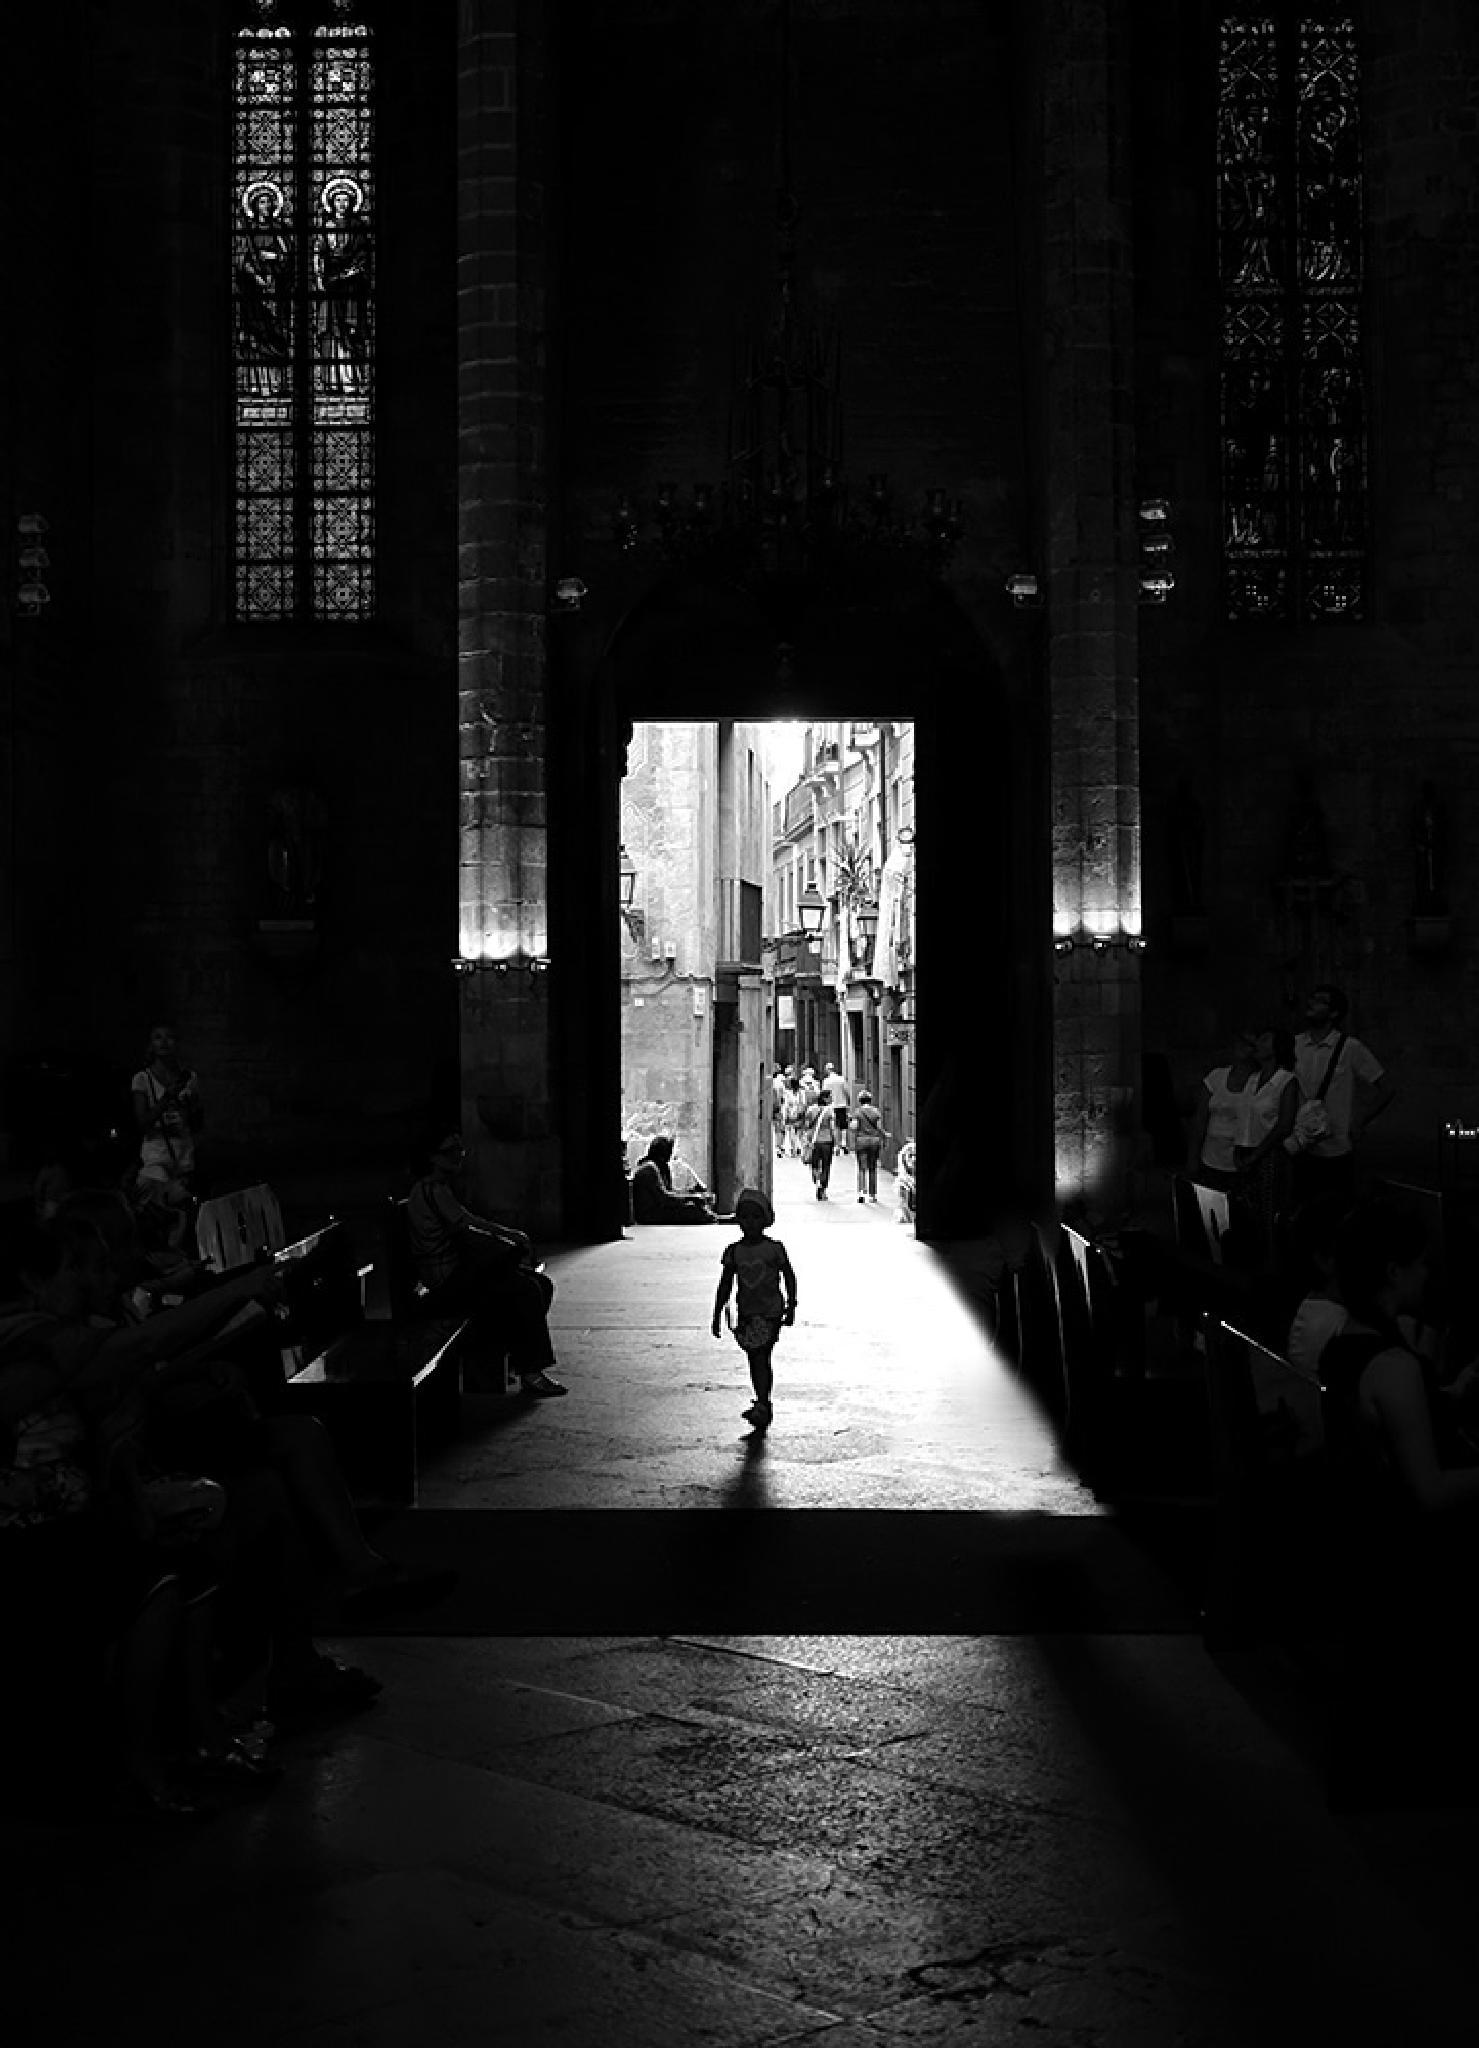 Lost in the church by juanferragut679